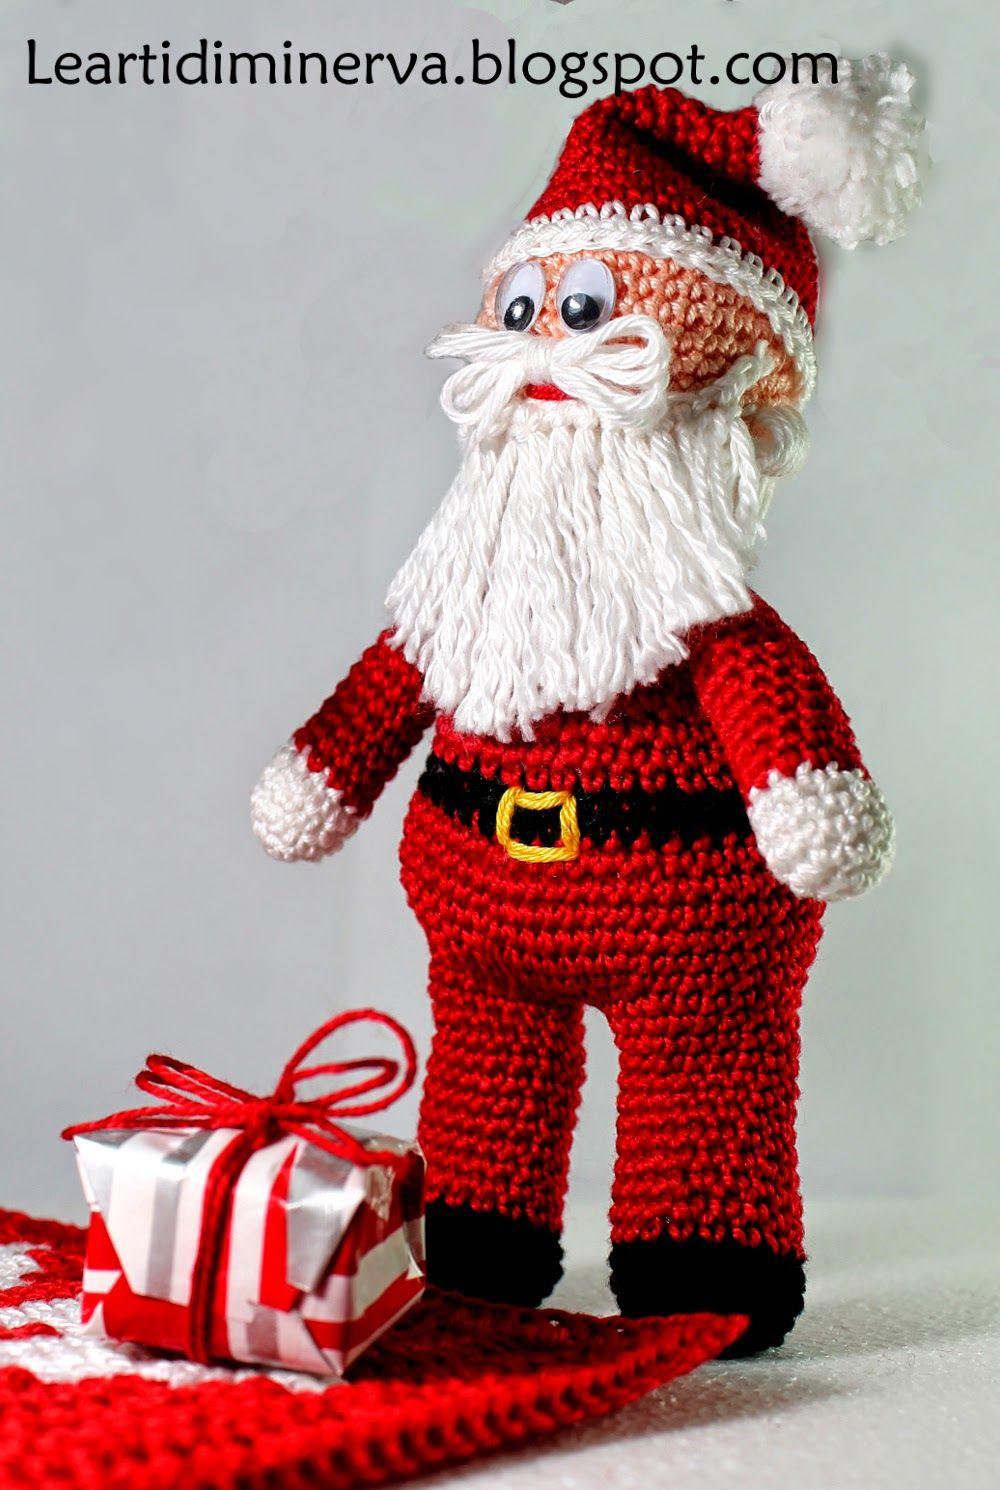 Amigurumi Natale.Maryj Handmade Santa Claus Is Coming To Town Babbo Natale Amigurumi Free Pat Christmas Crochet Patterns Christmas Crochet Patterns Free Christmas Crochet